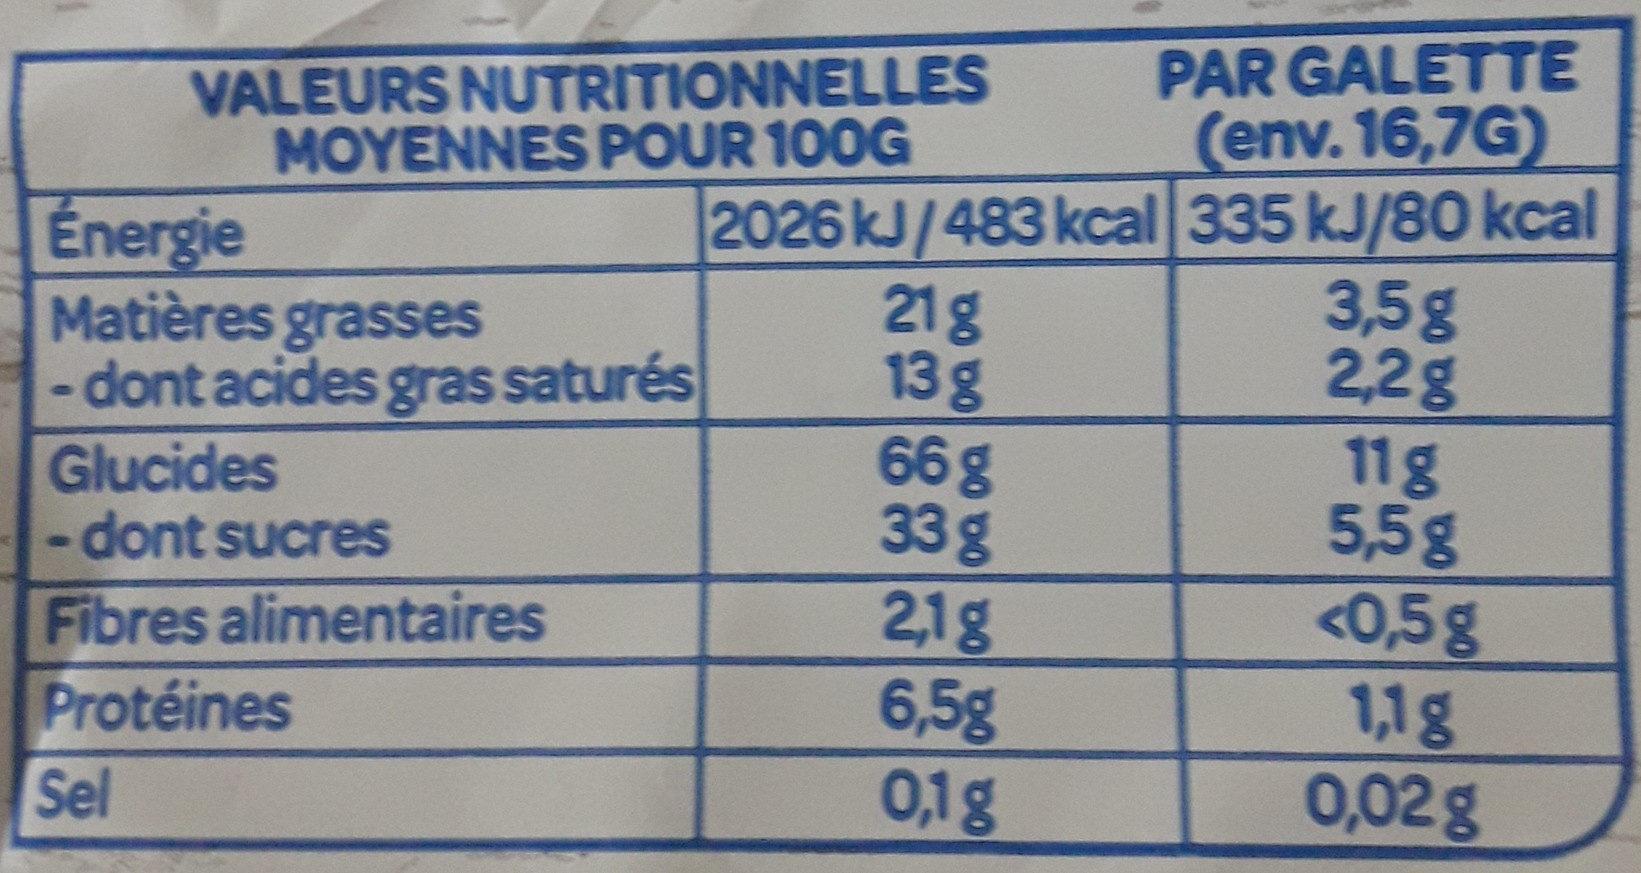 Galette maïs - Informations nutritionnelles - fr